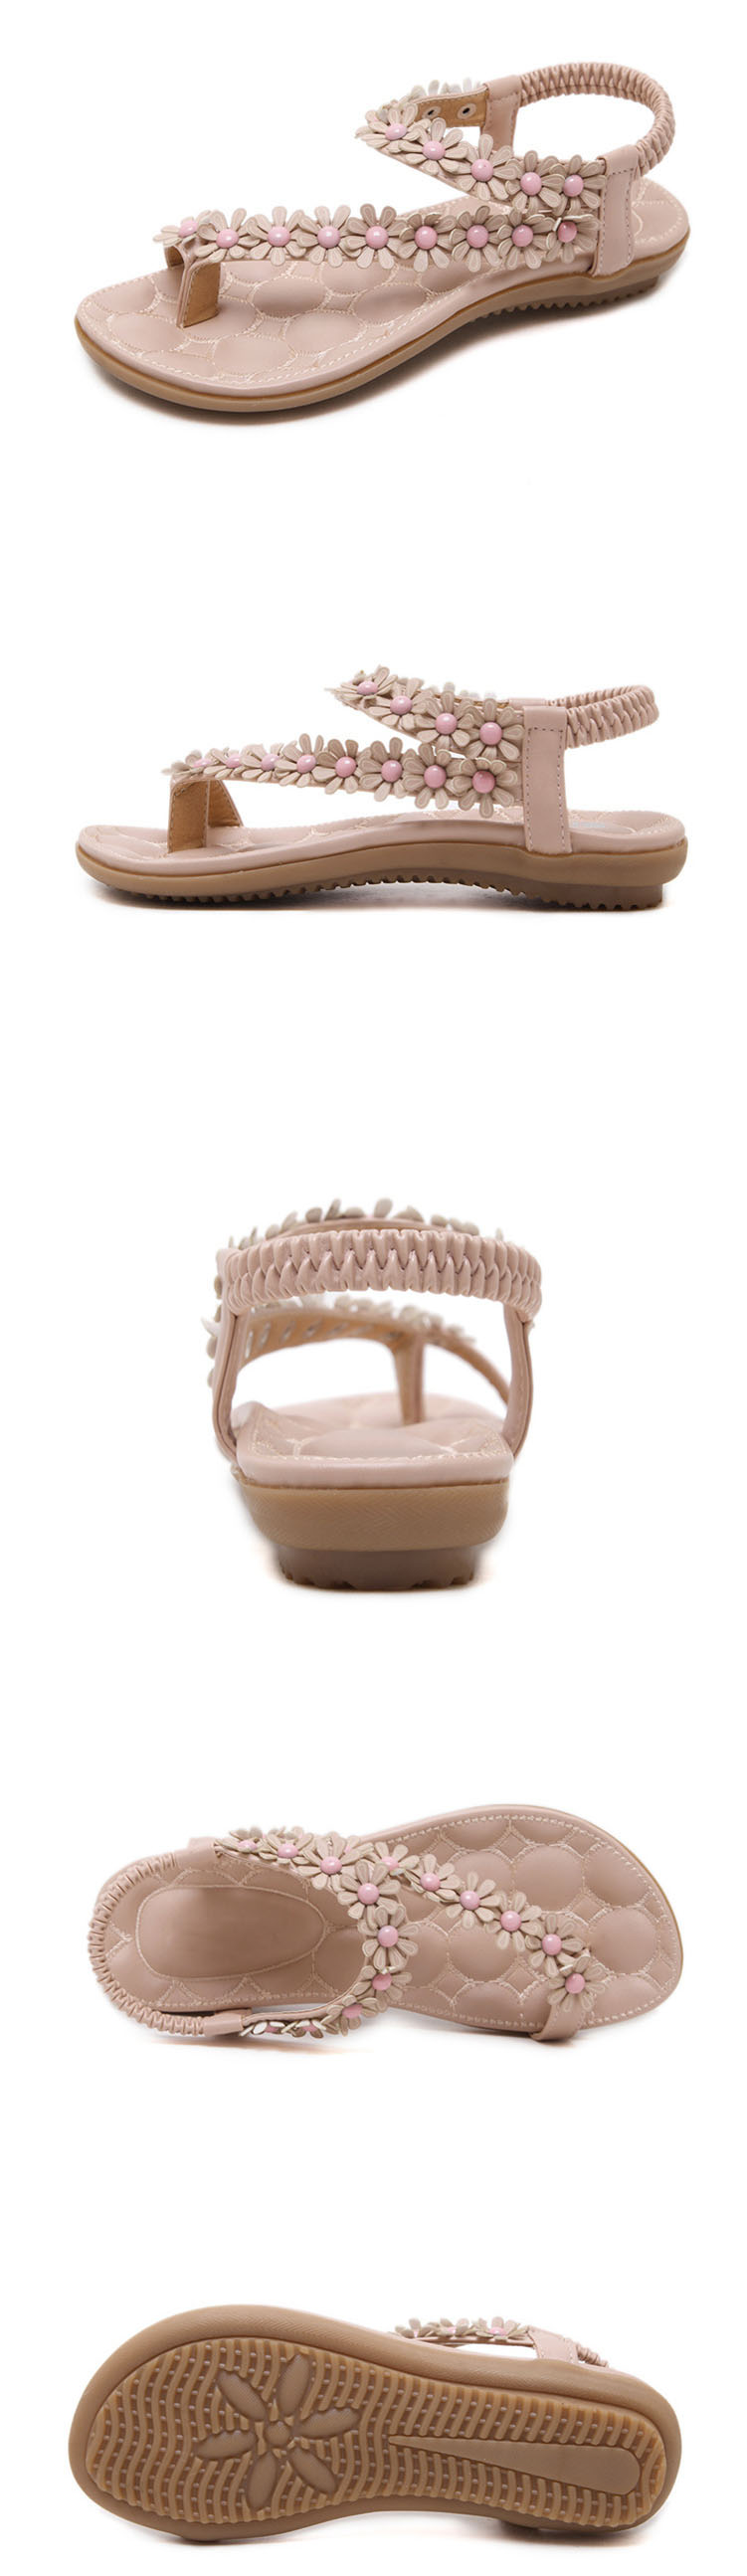 03f8338def785 Women sandals Bohemian Ethnic Crystal Flat Sandals Roman Rhinestone  Gladiator Flip Flops Flower Casual Shoes Girl Wedding